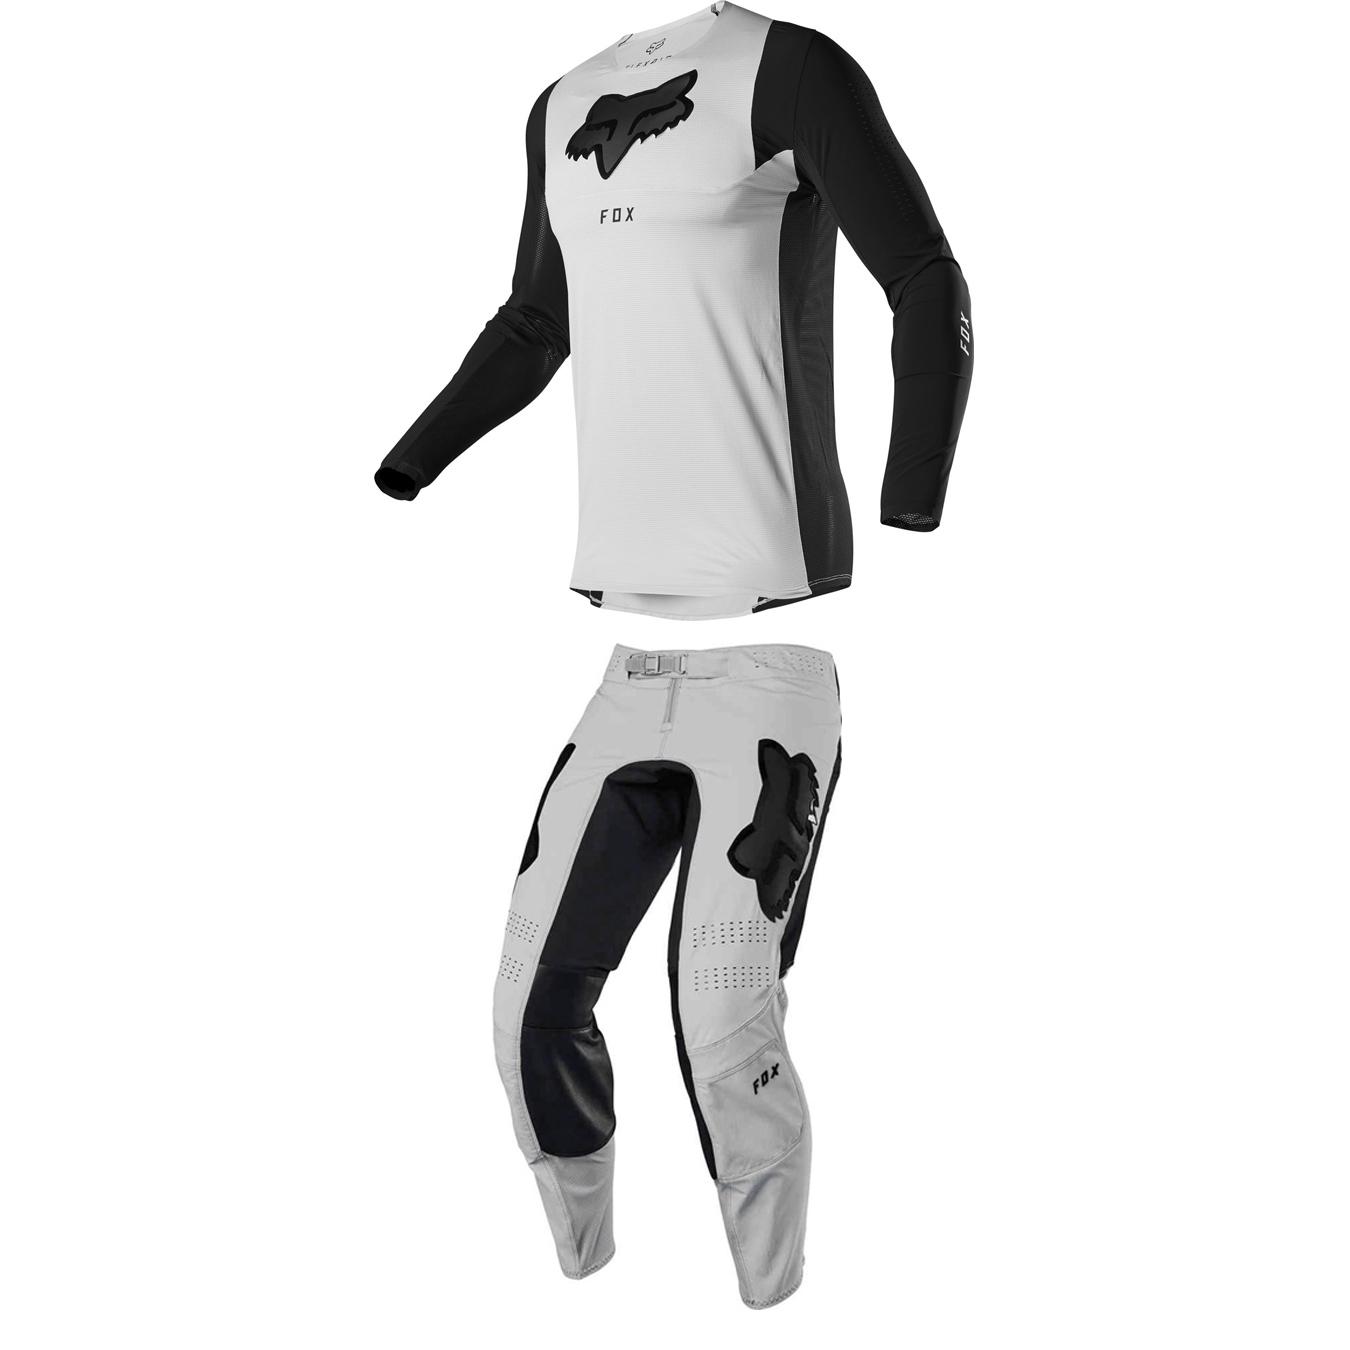 Completo cross enduro Fox FLEXAIR DUSC Grey 2020 pantaloni+maglia 1